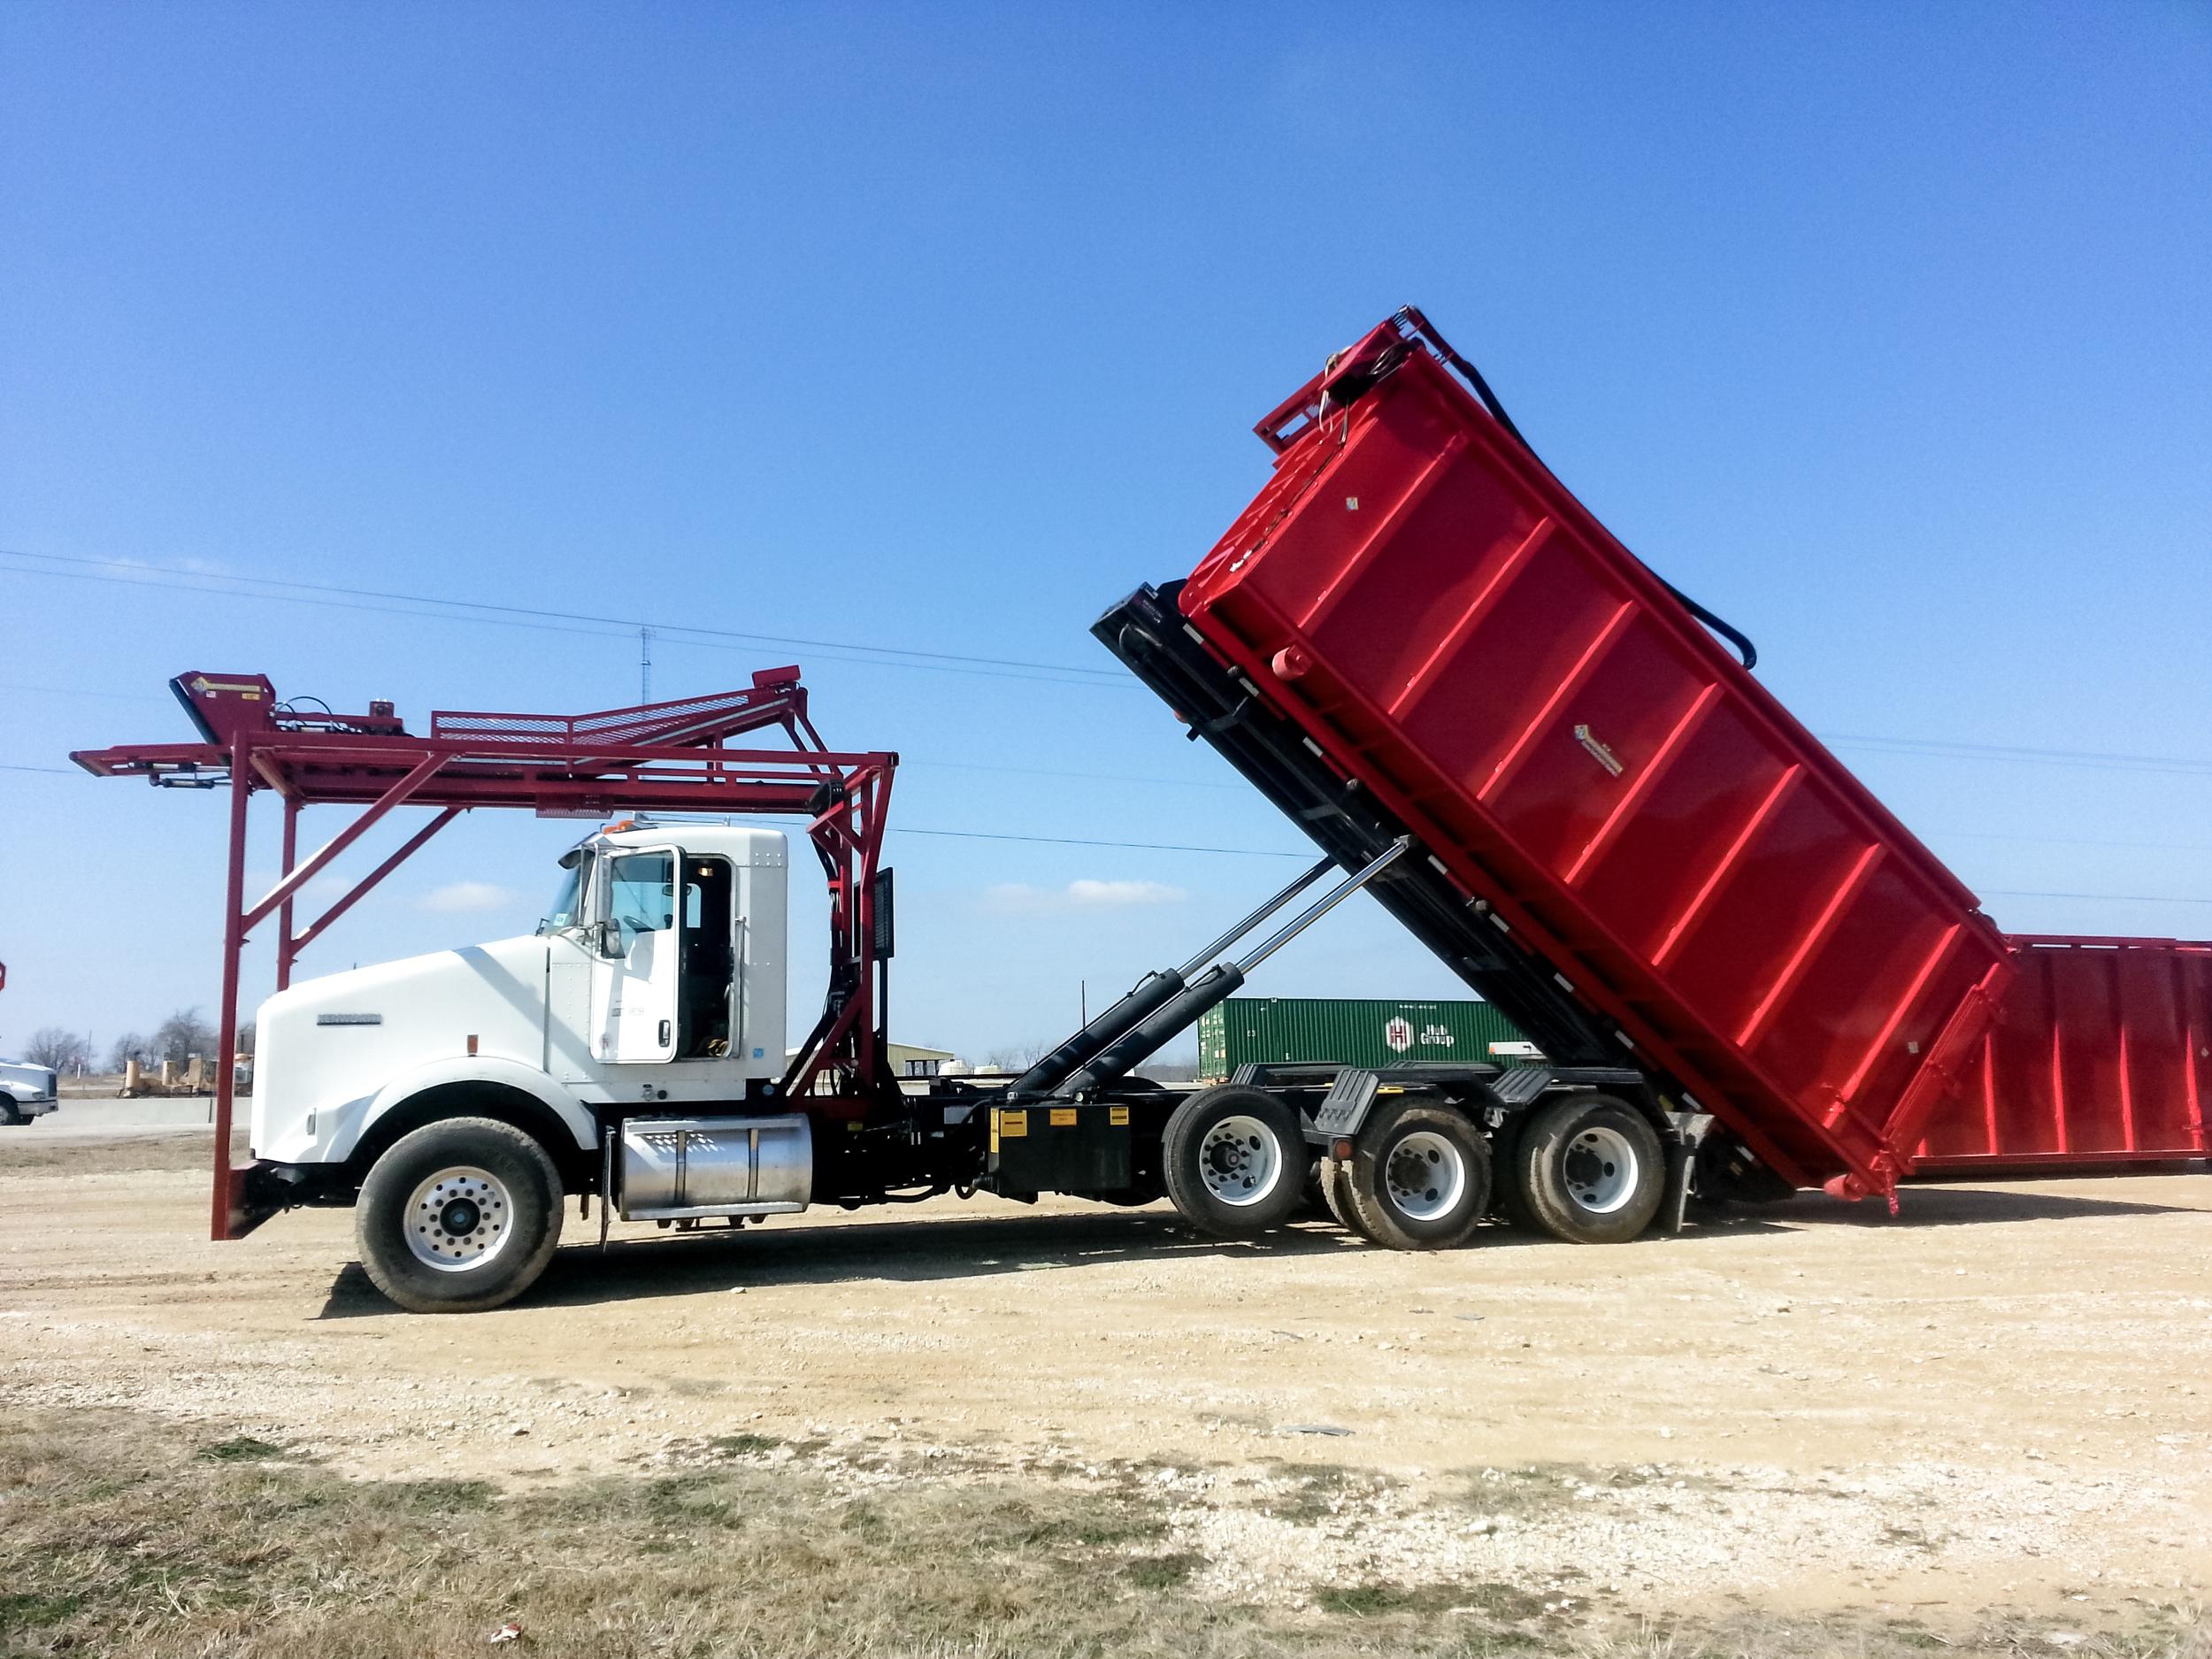 The Hose Mule Truck & Trailor 5.jpg